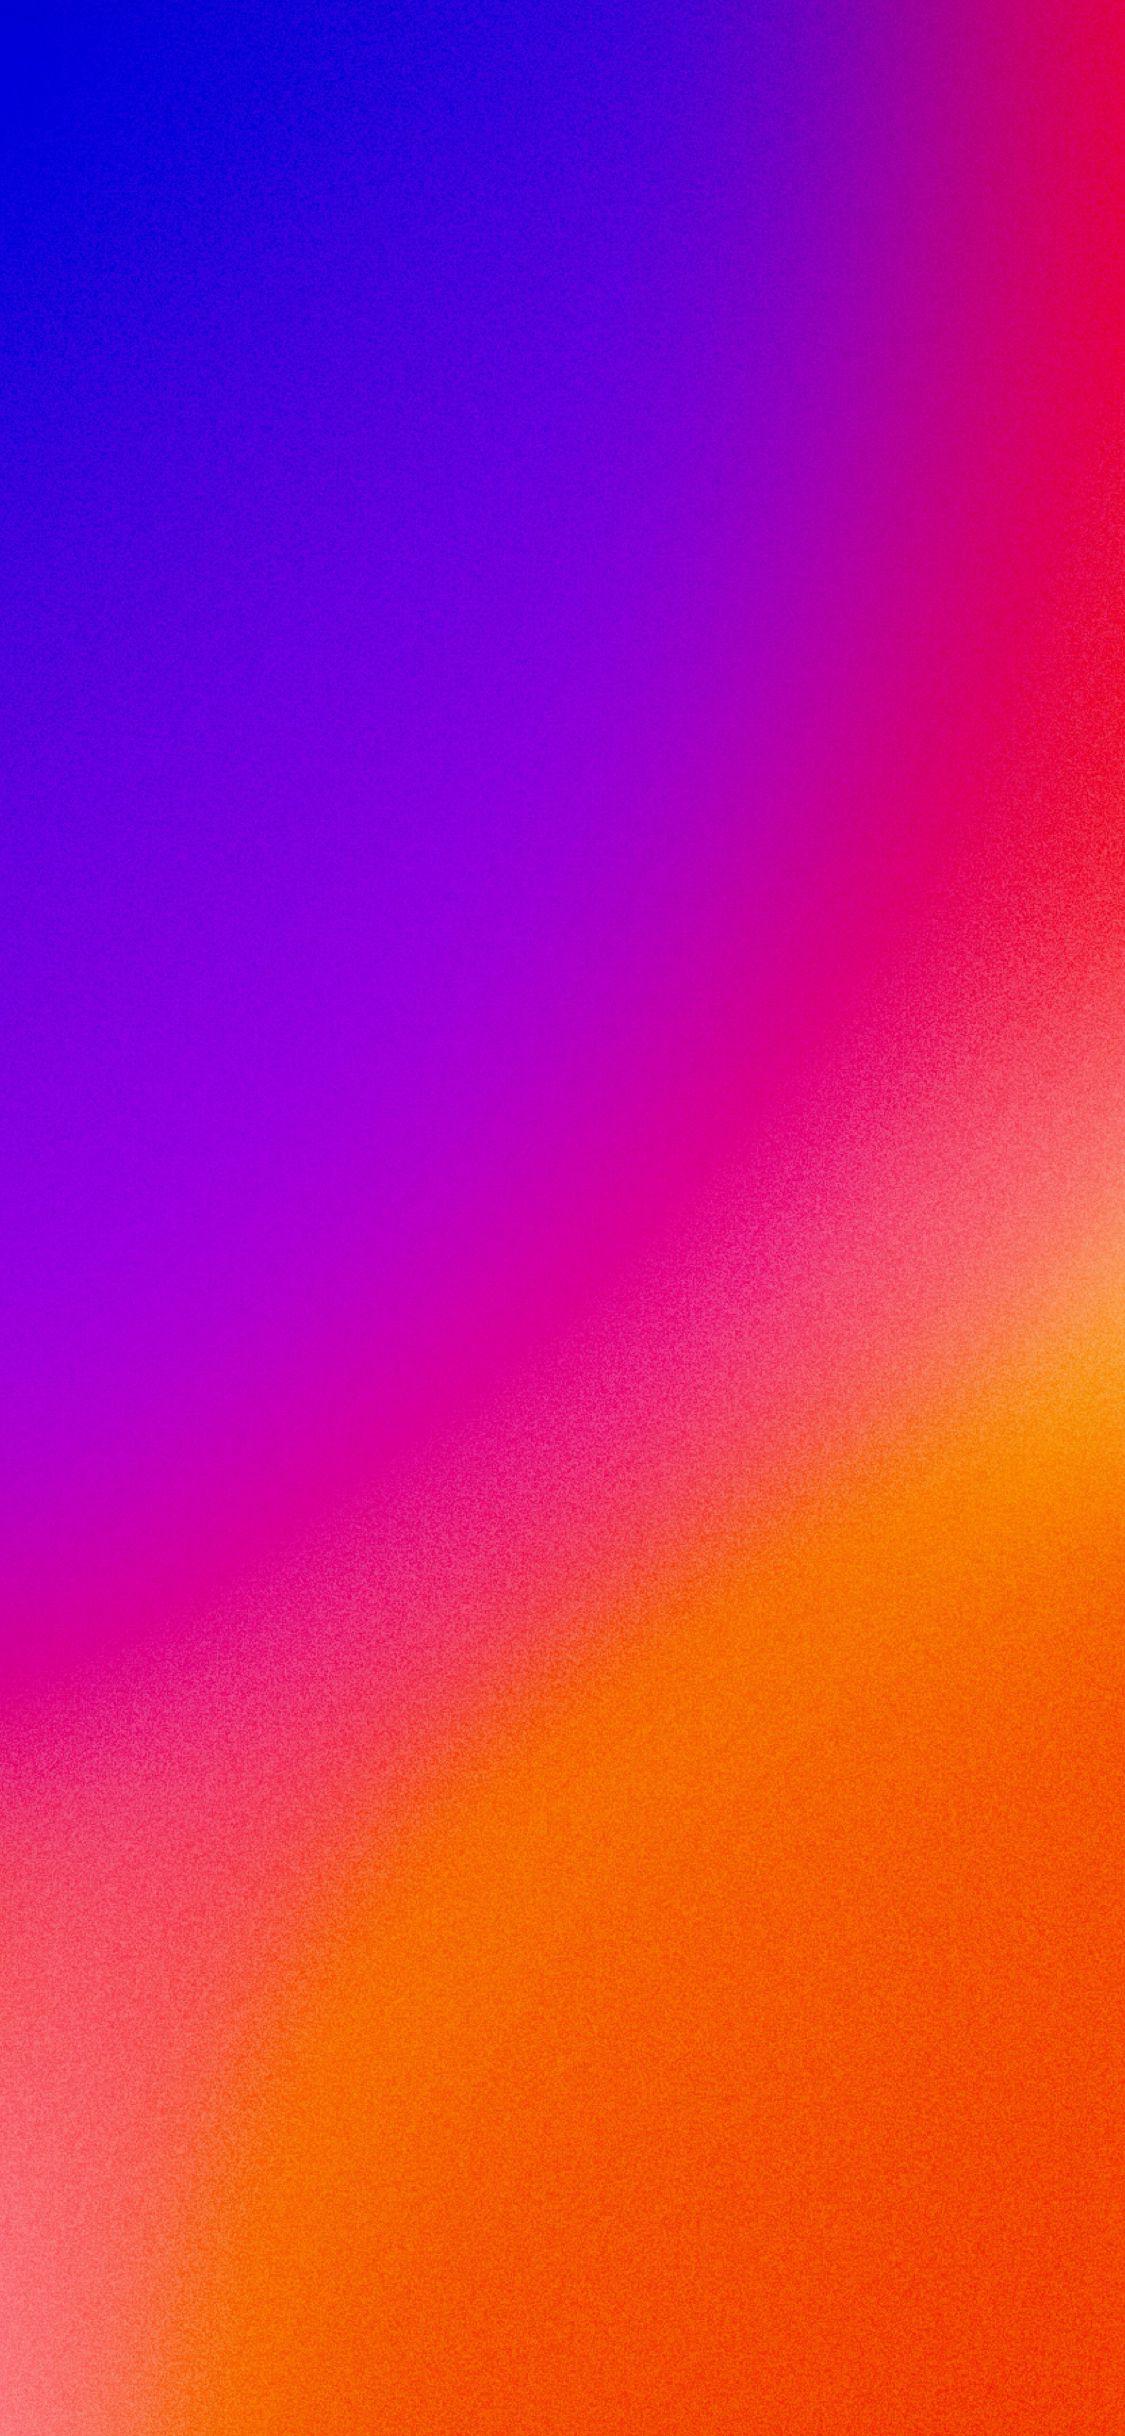 Colors New wallpaper iphone, Ombre wallpaper iphone